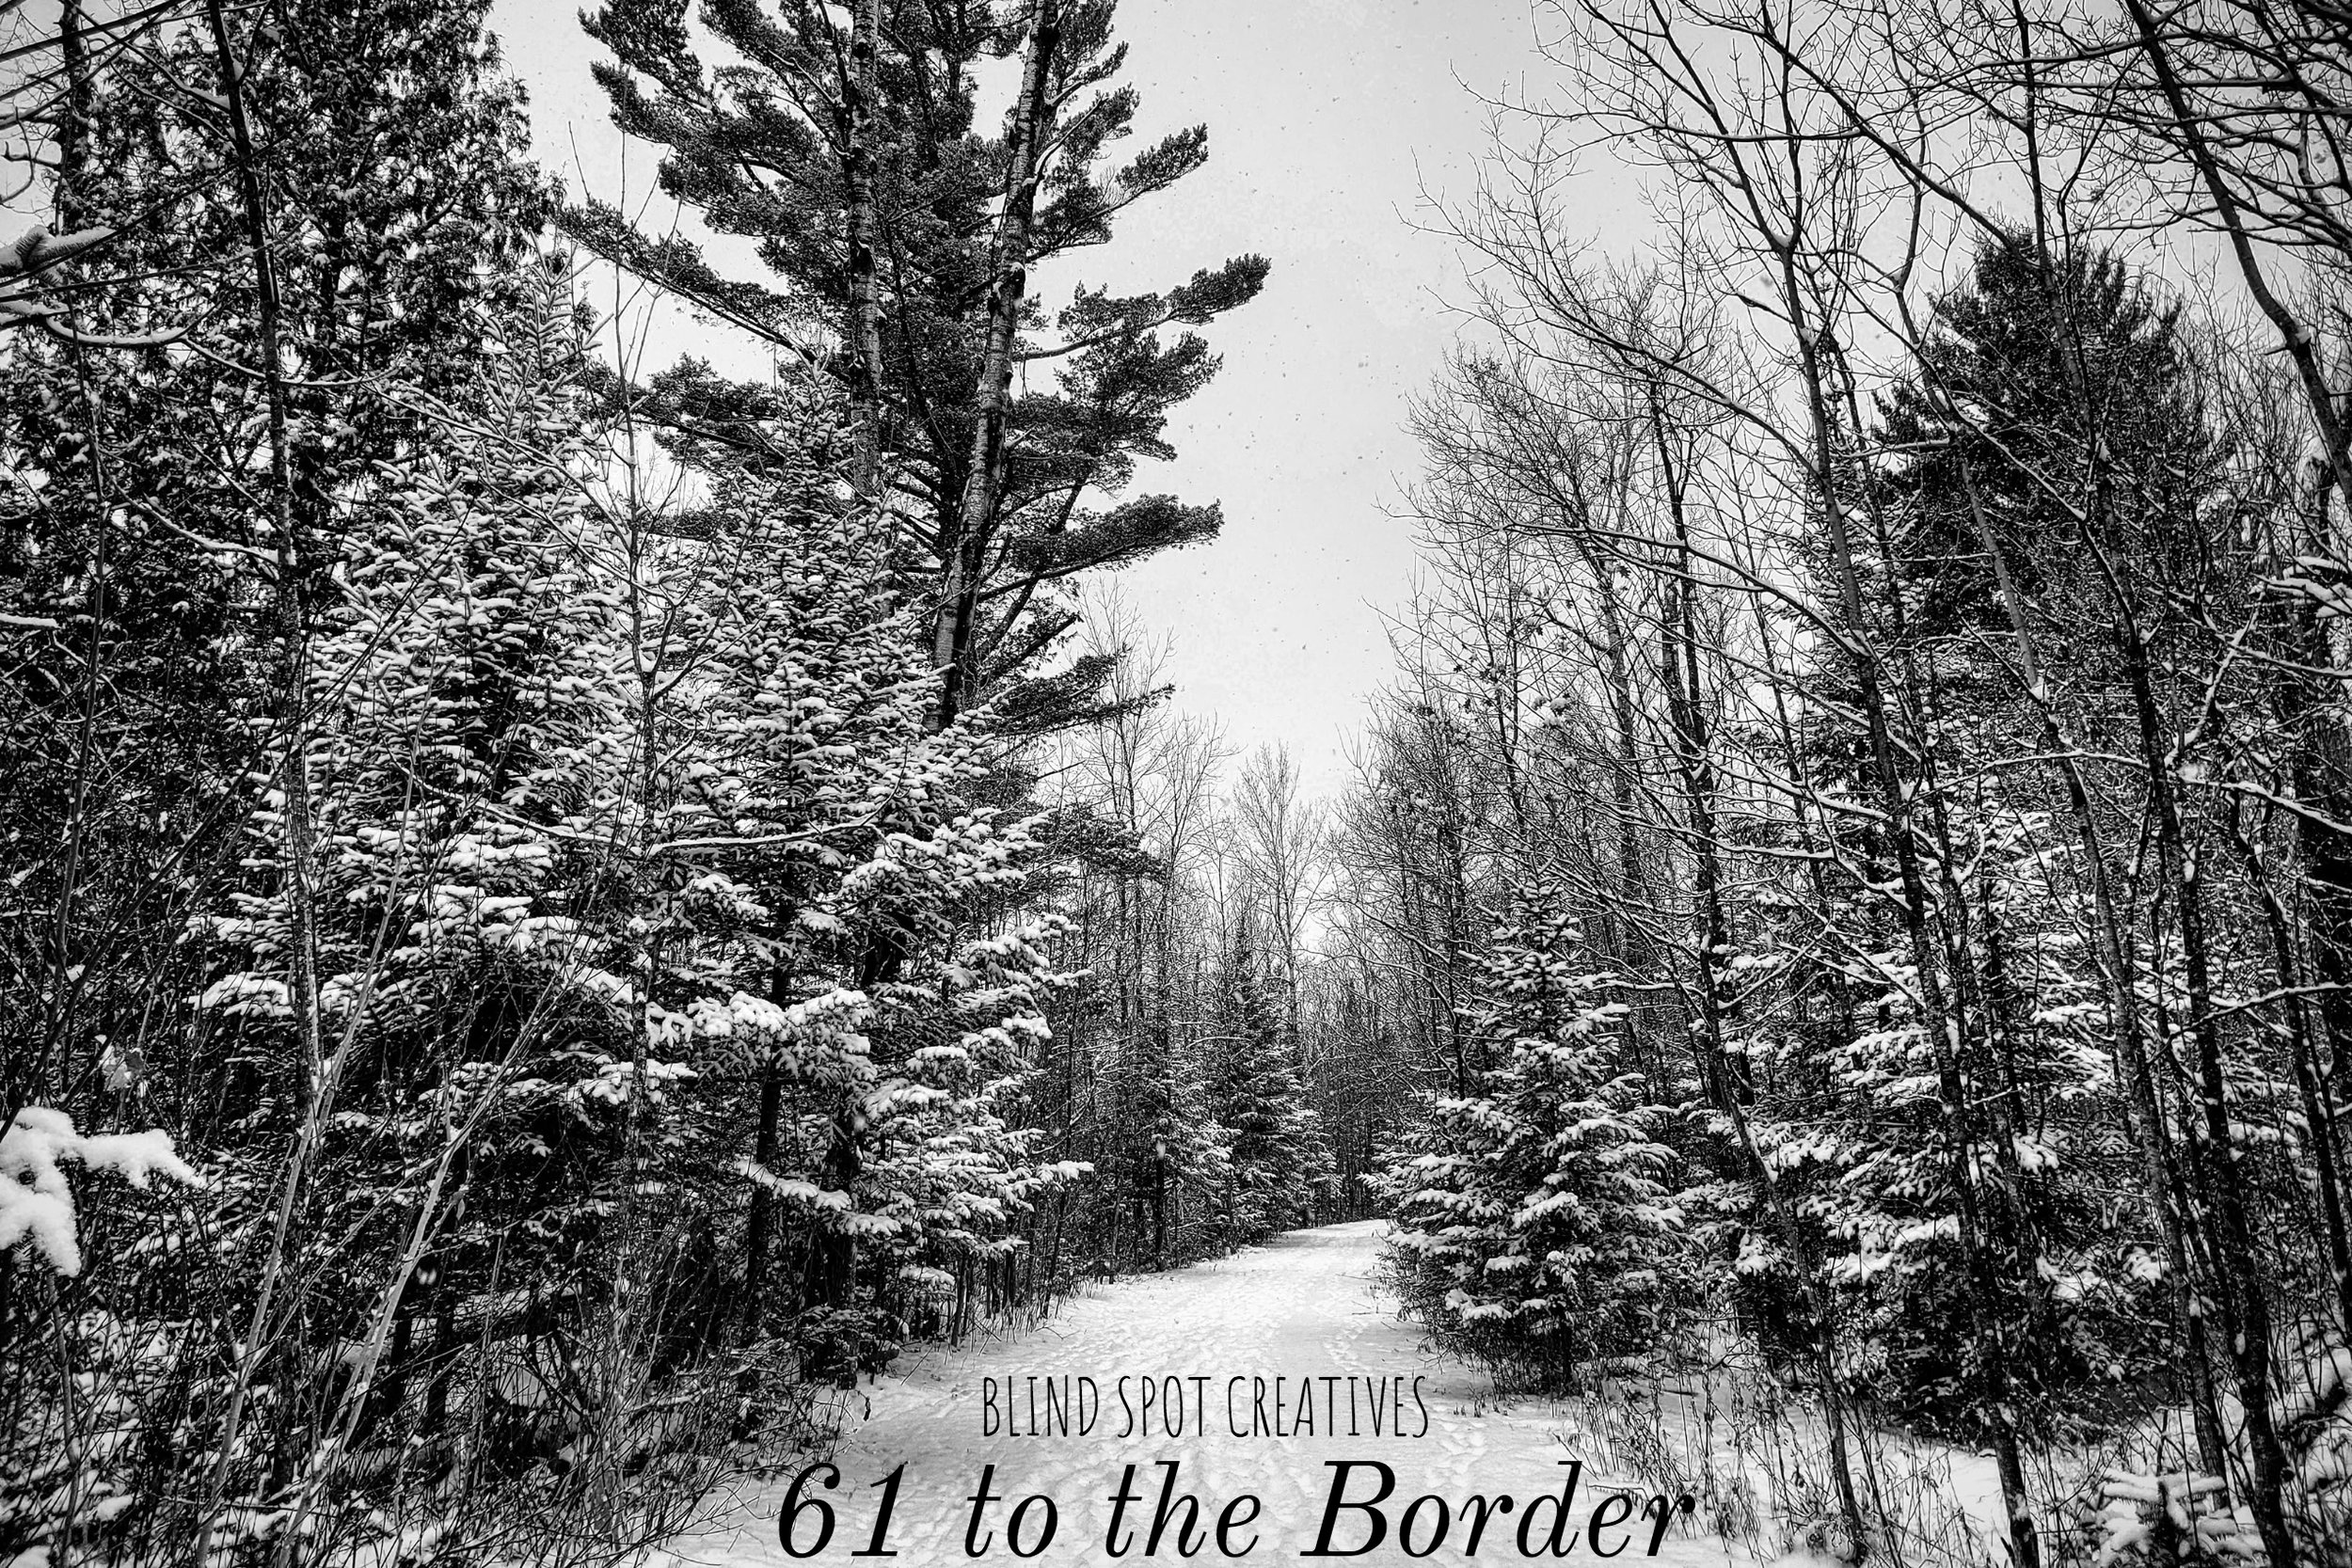 Blind Spot Creatives - 61 to the Border - Alyssa Johnson - Poem